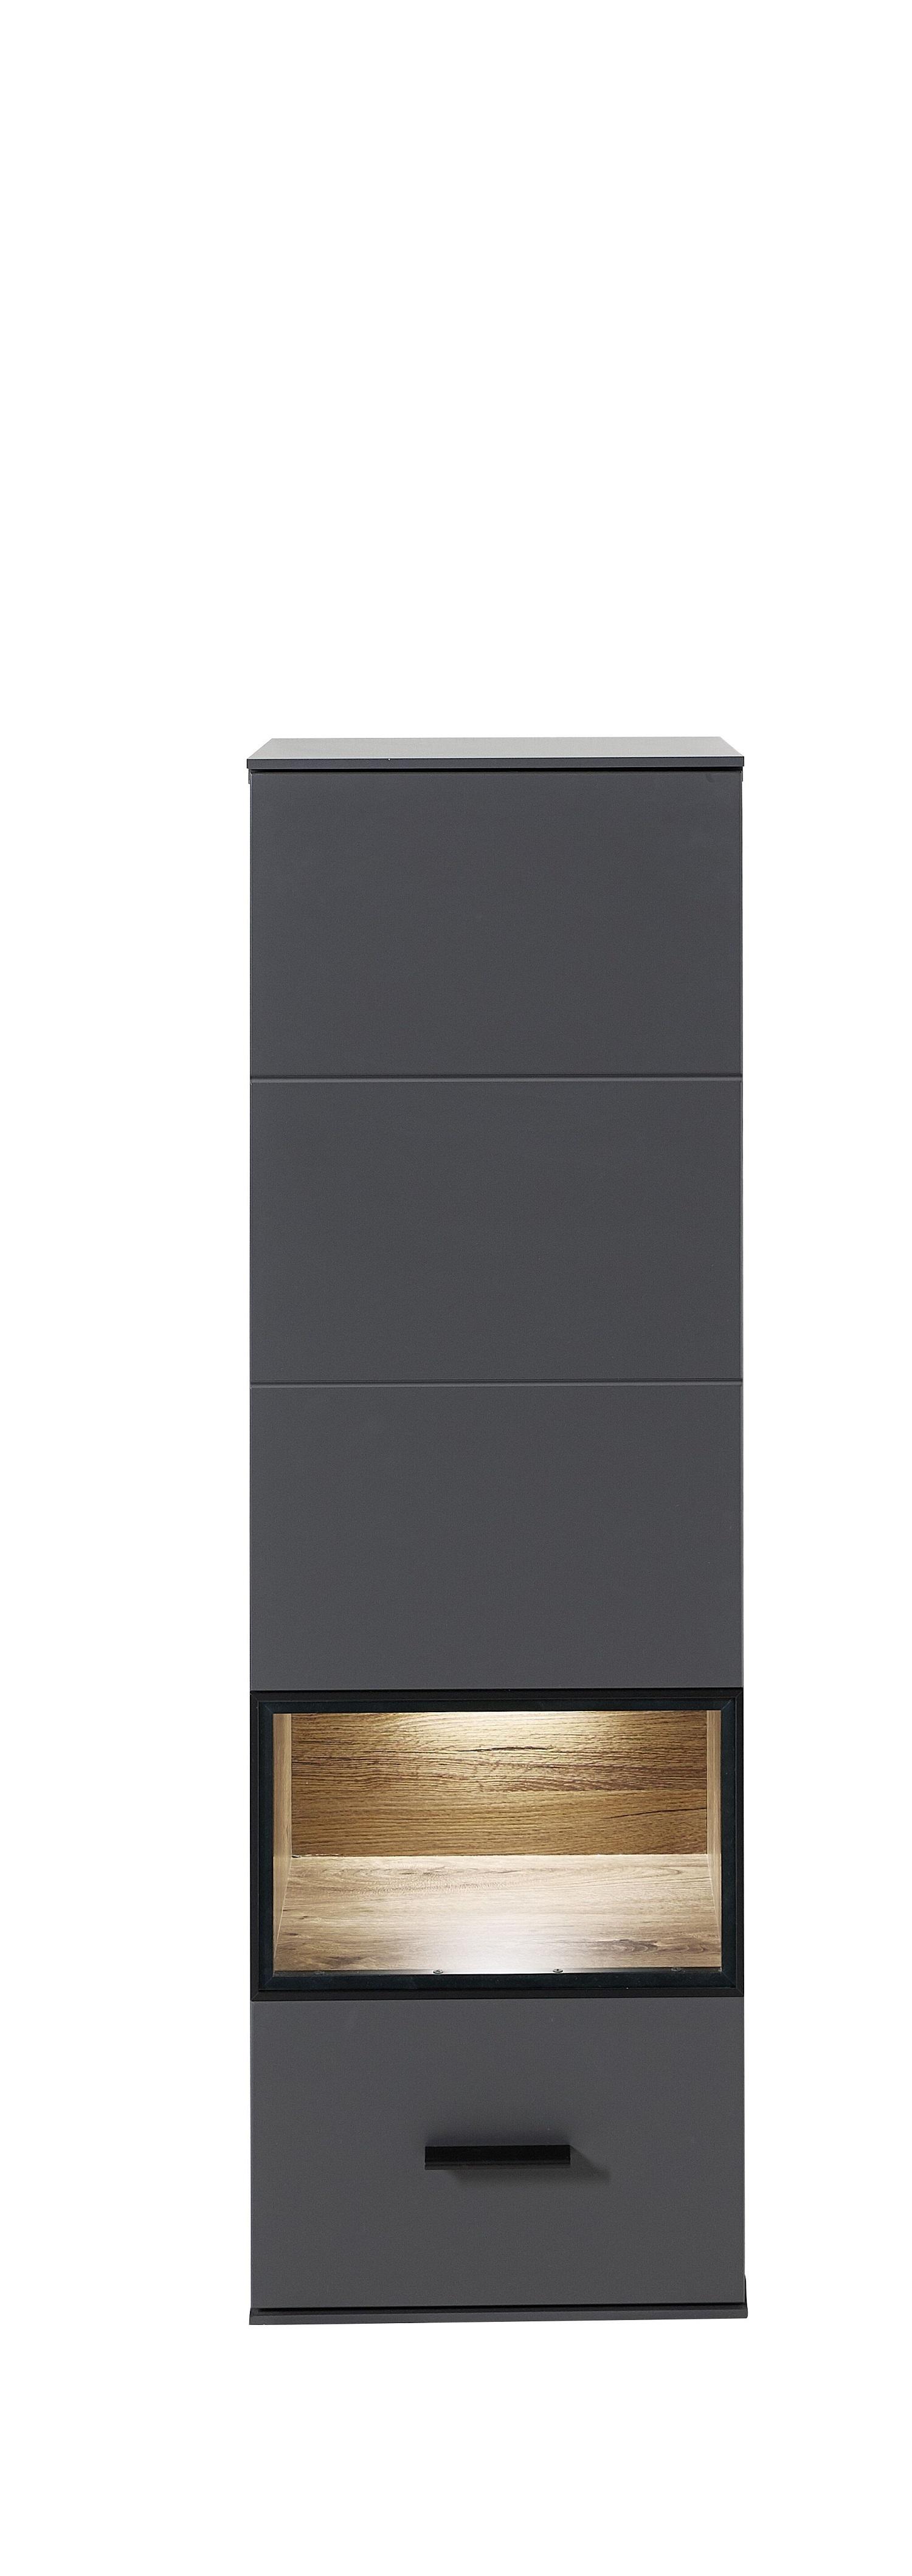 Vitrina suspendata din pal si MDF cu 1 usa, Madeline Grafit, l40xA36xH125 cm imagine